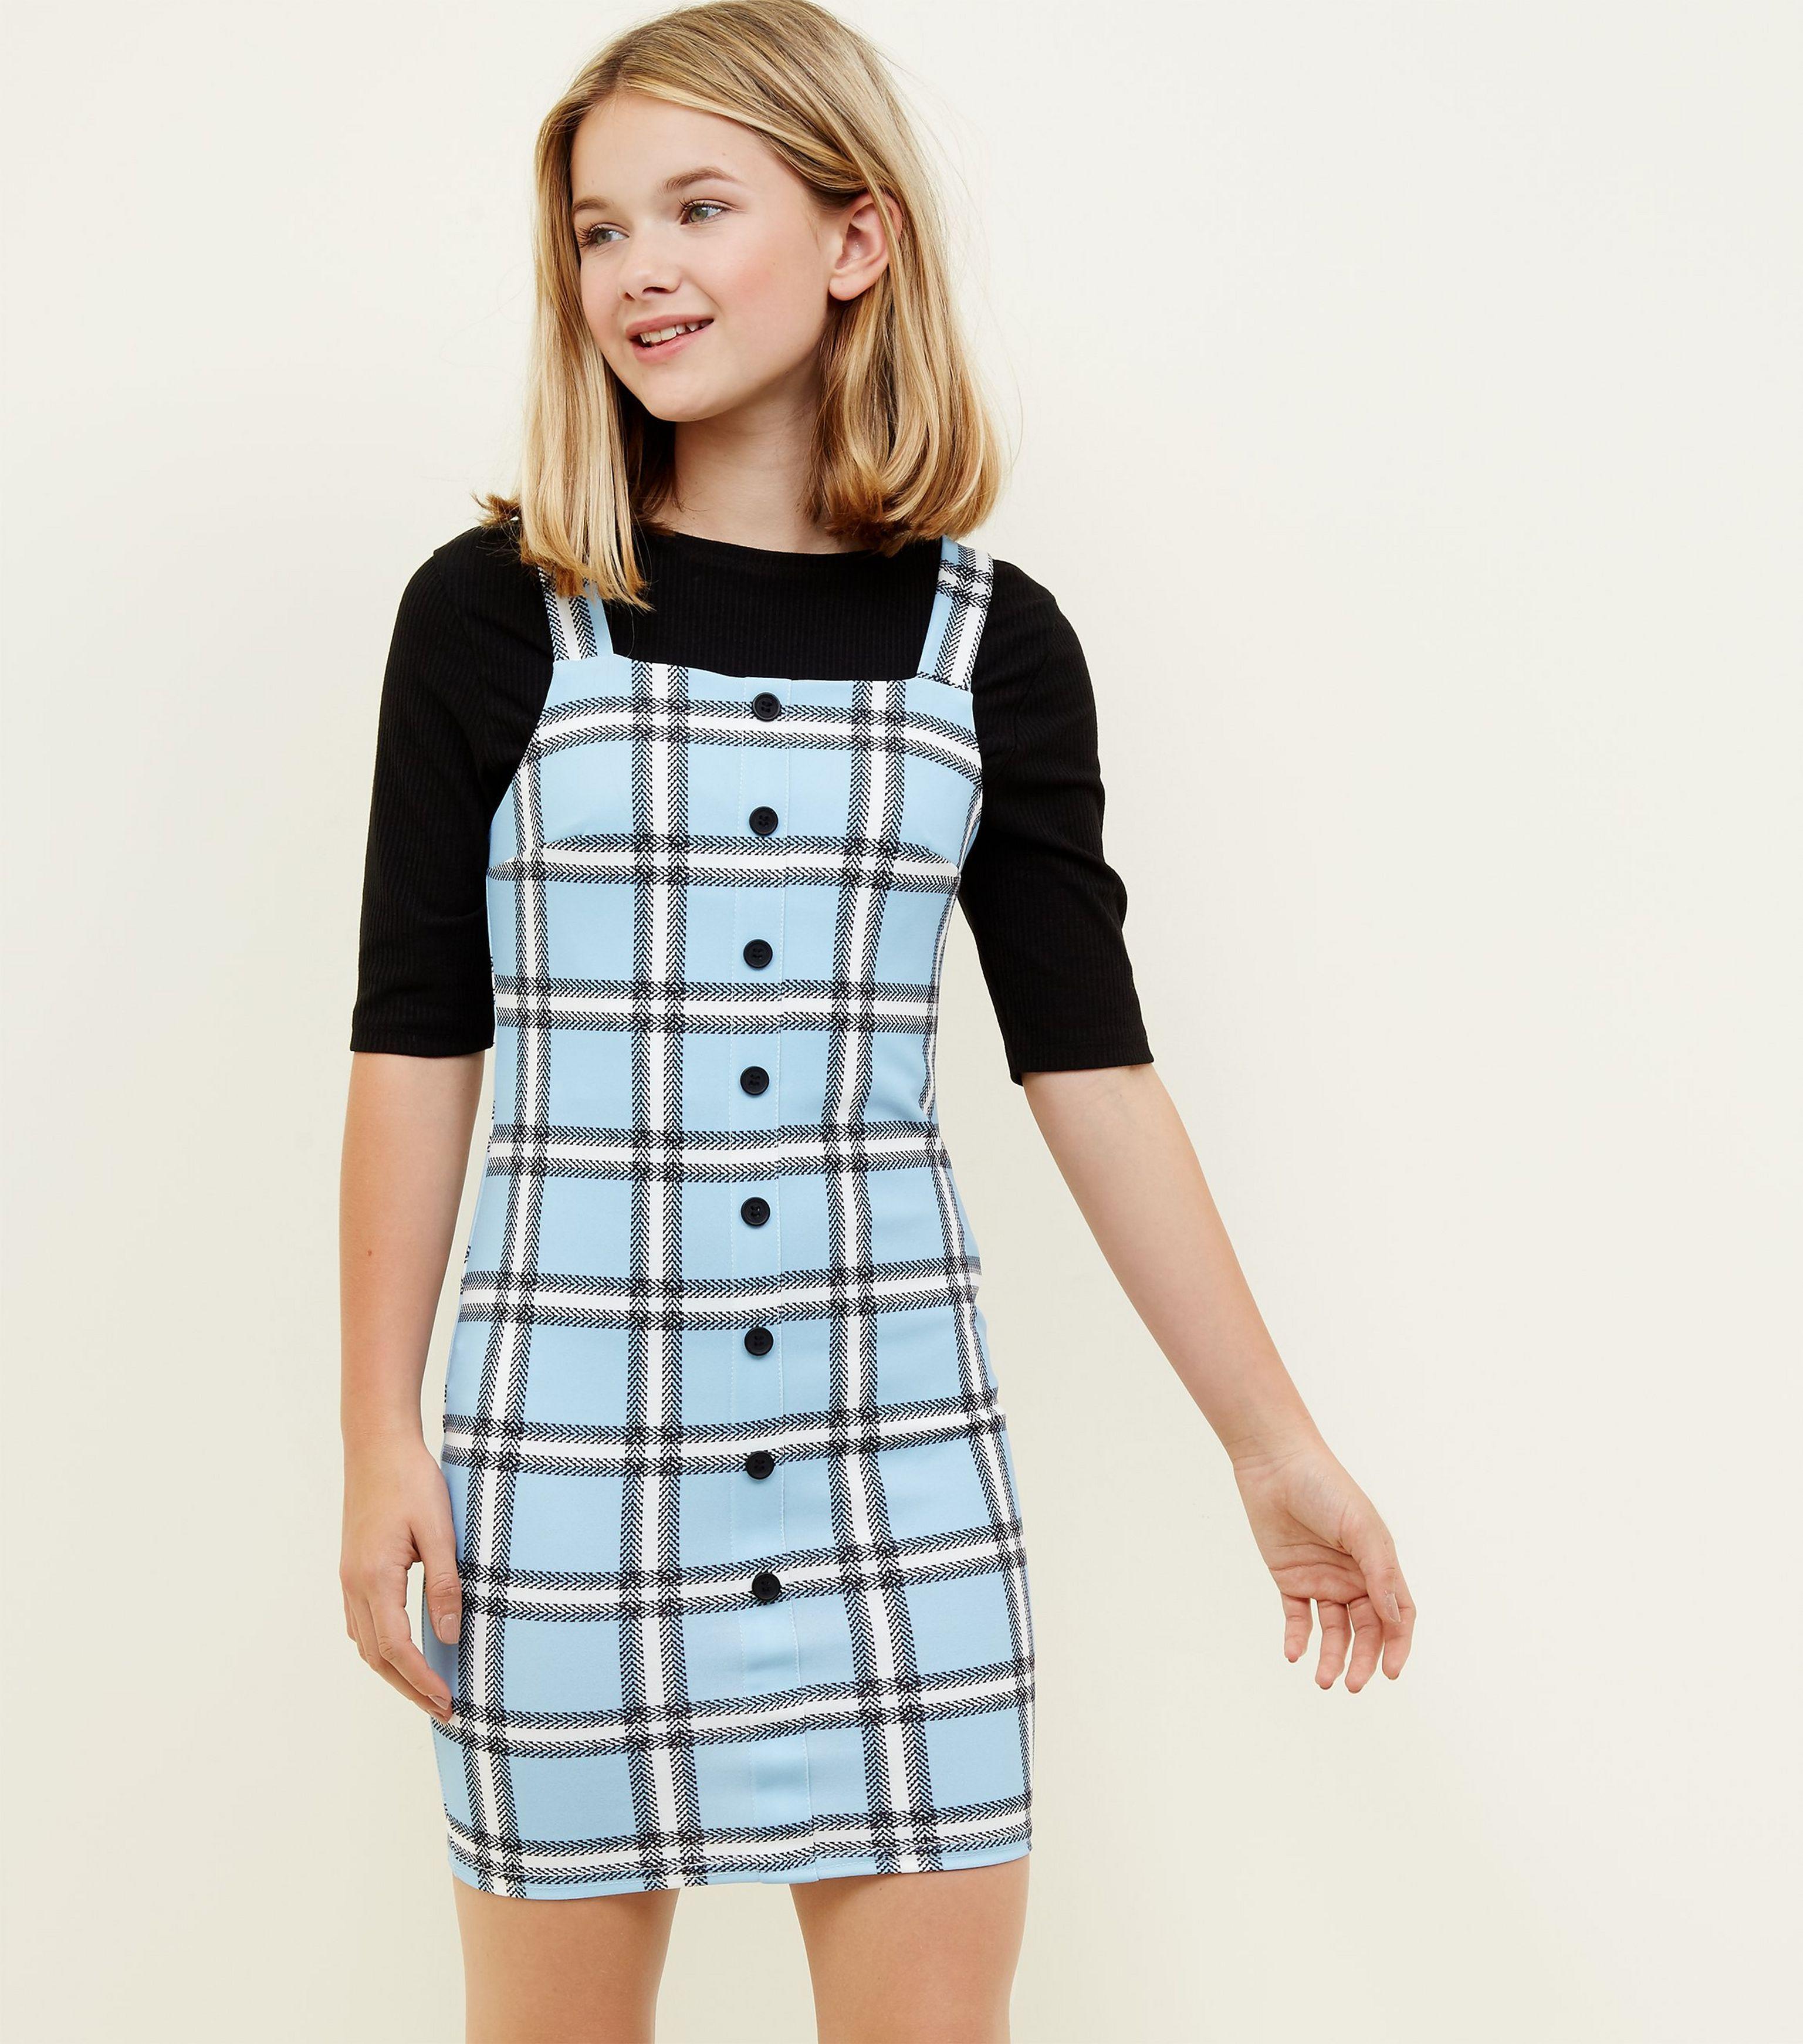 0d8cf05c0ba New Look. Women s Girls Blue Check Button Front Bodycon Pinafore Dress